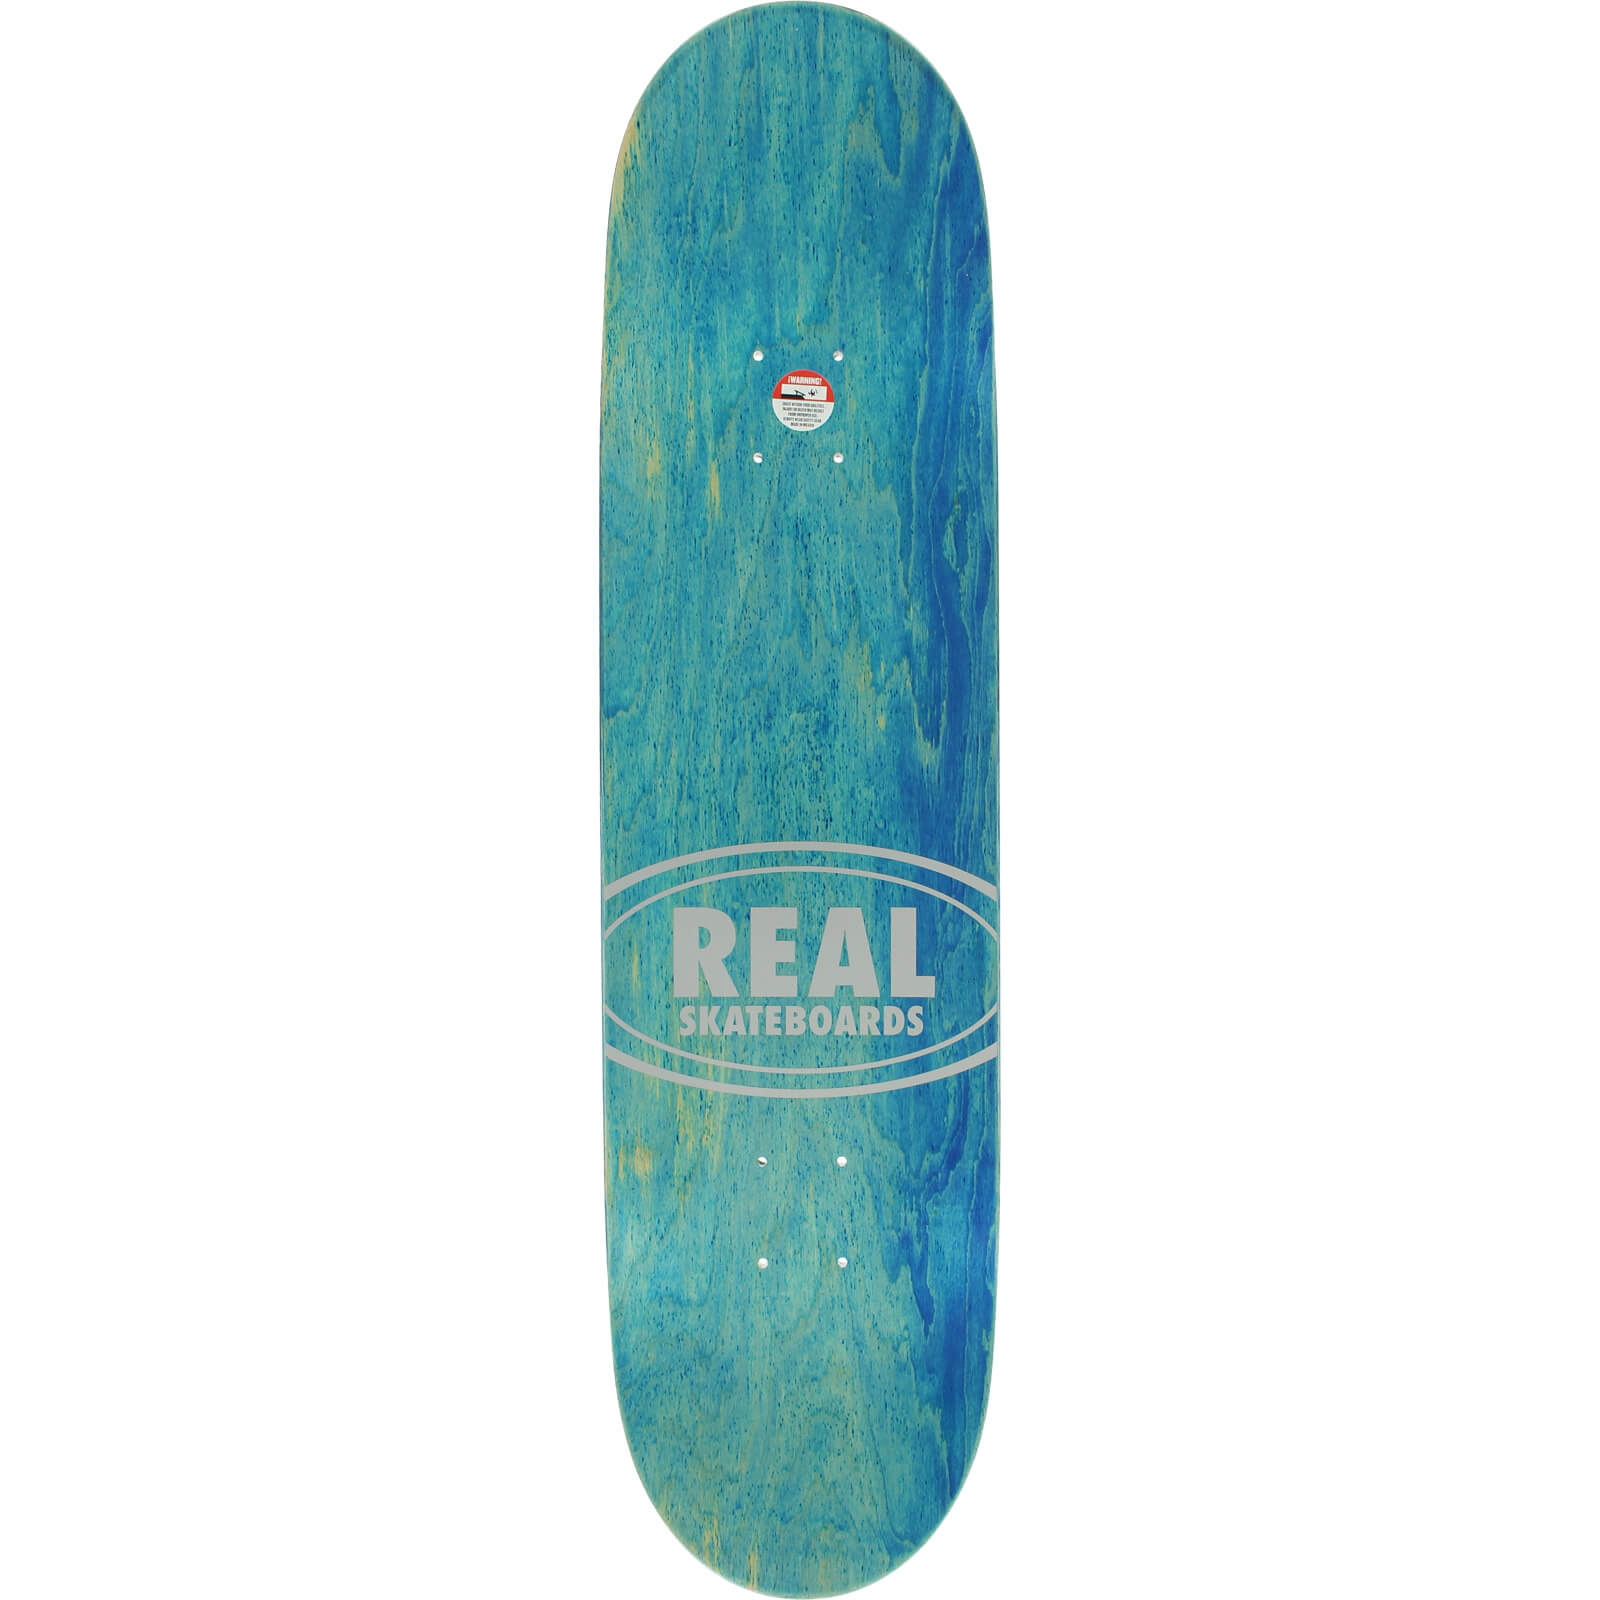 Real Skateboards Jake Donnelly Low Pro 2 Bankroll